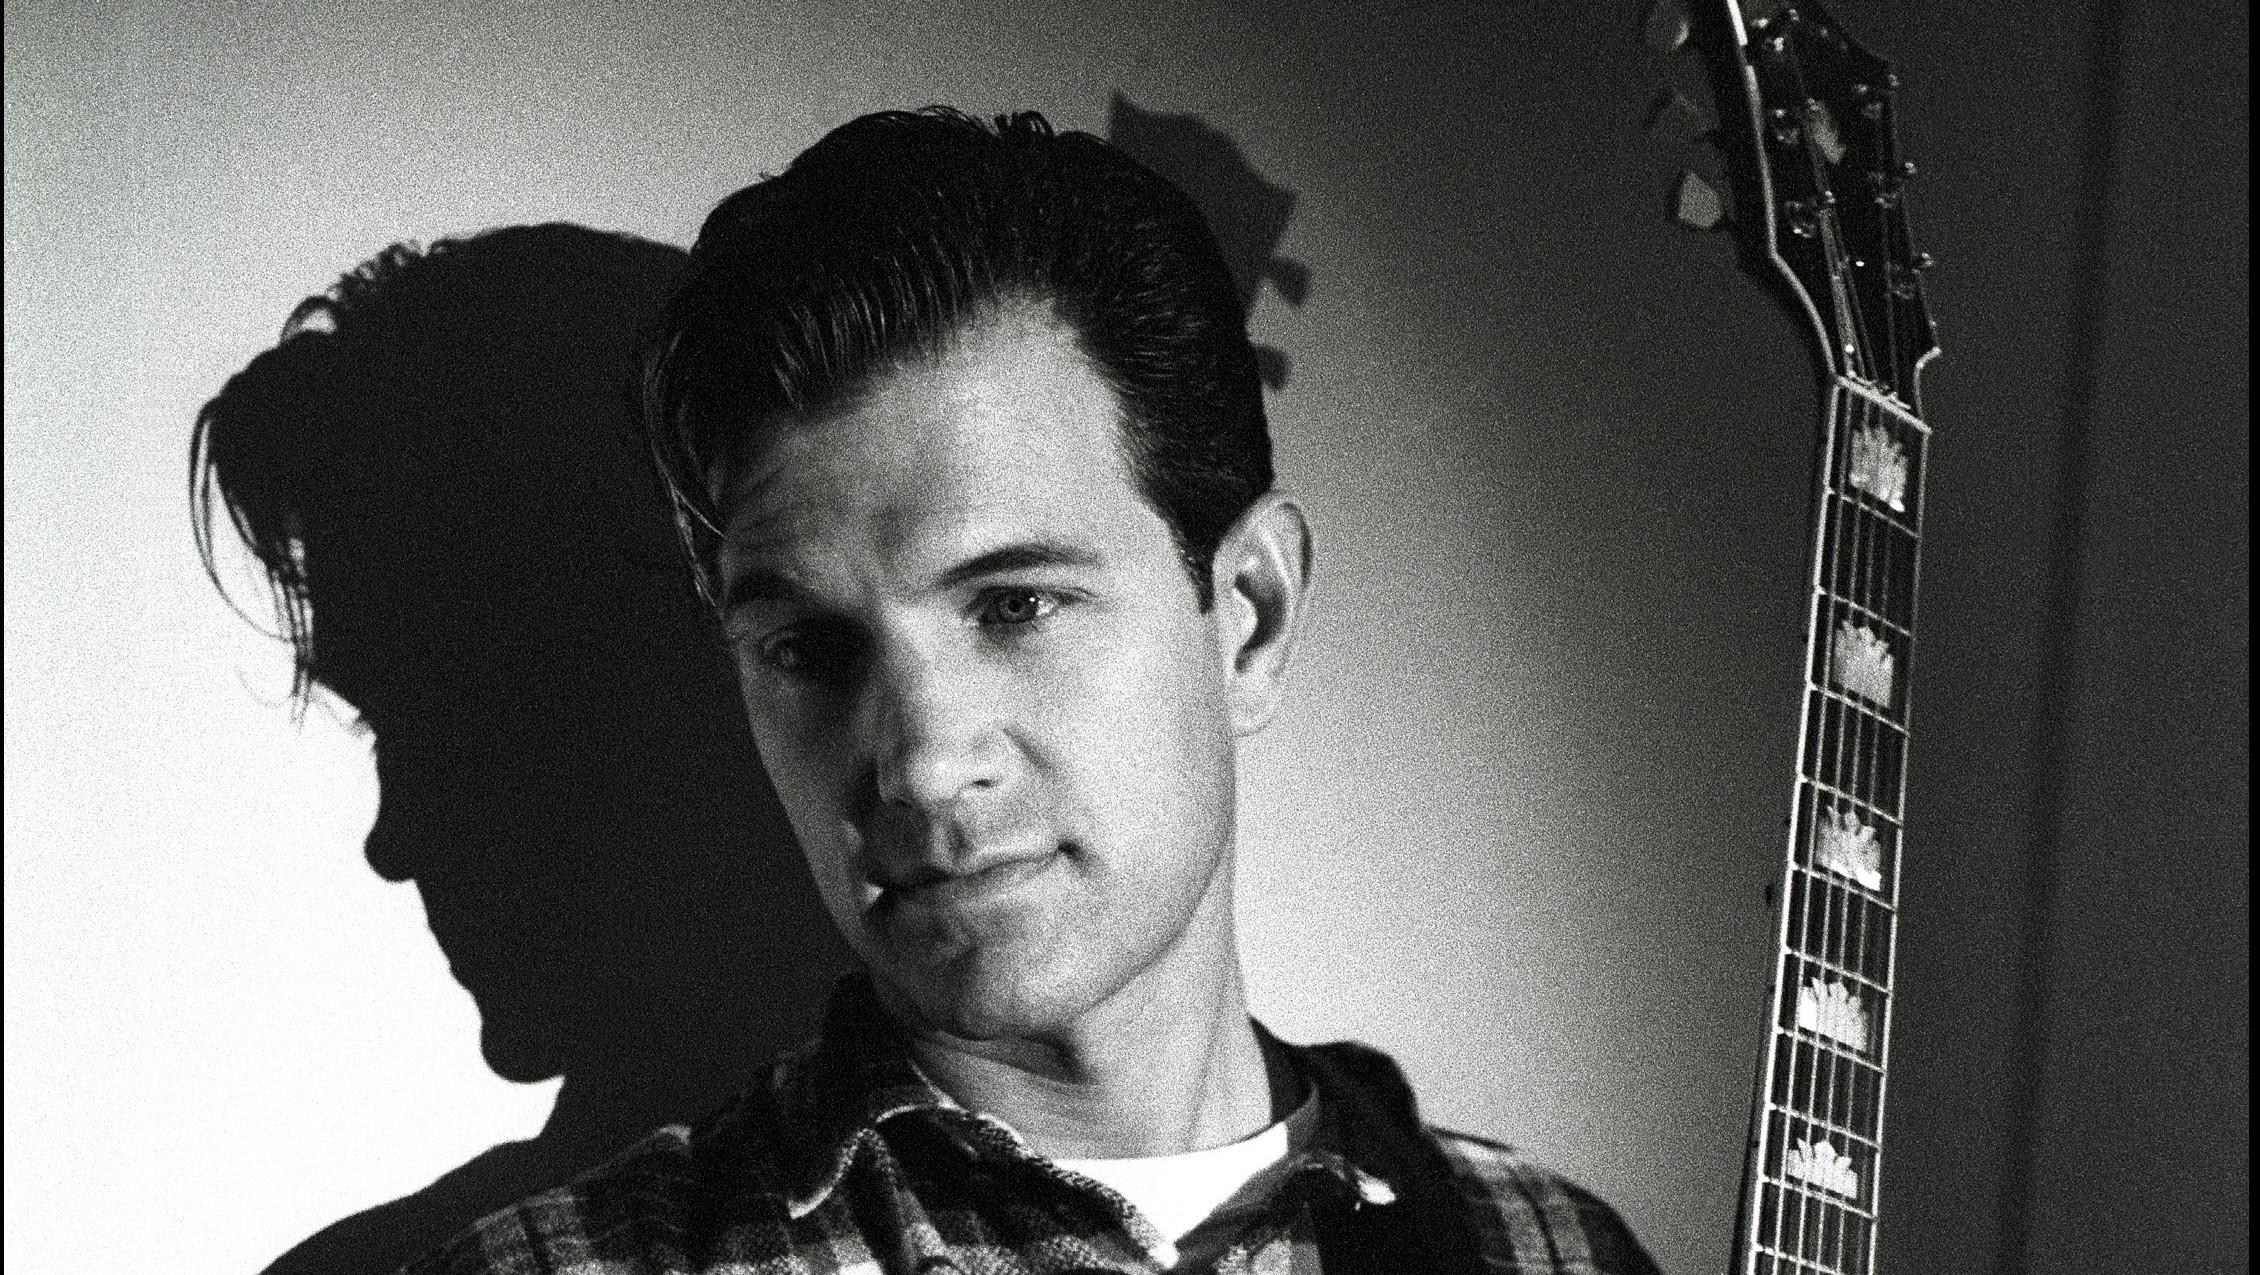 Chris Isaak, portrait, Americain Hotel, Amsterdam, Netherlands, 9th May 1995. (Photo by Rob Verhorst/Redferns)